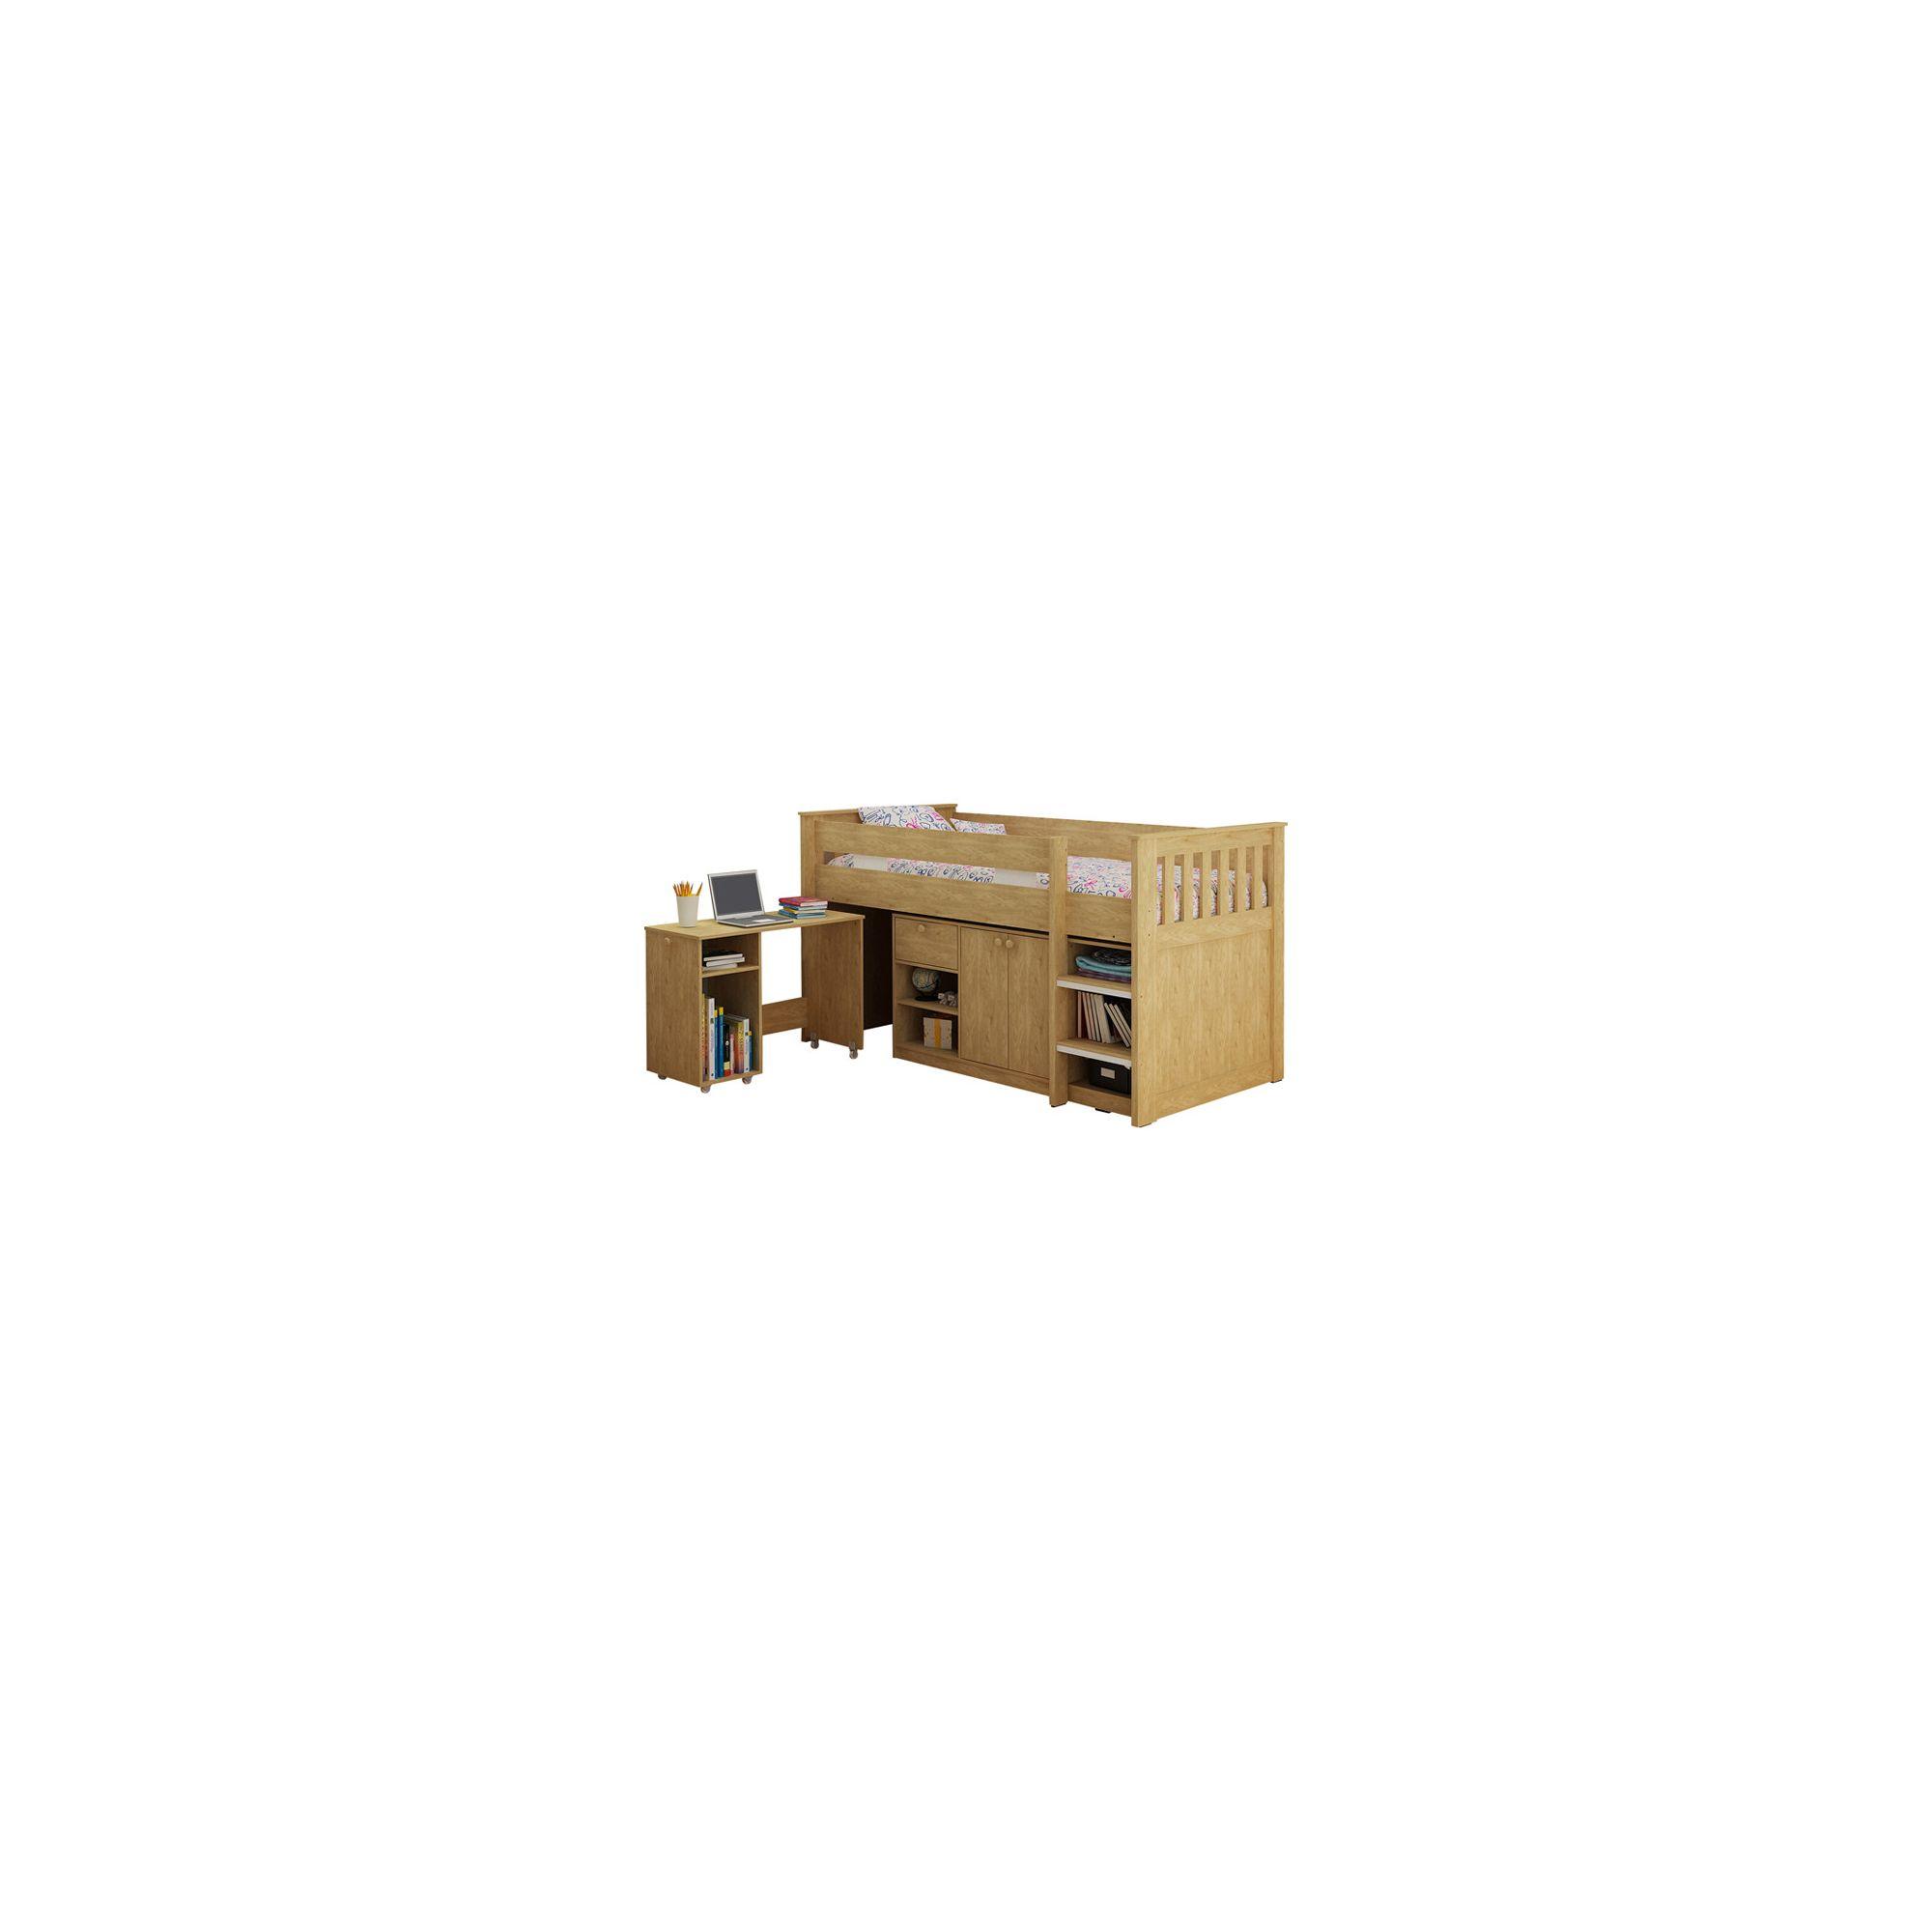 Home Essence Merlin Study Bunk Bed - Oak at Tesco Direct